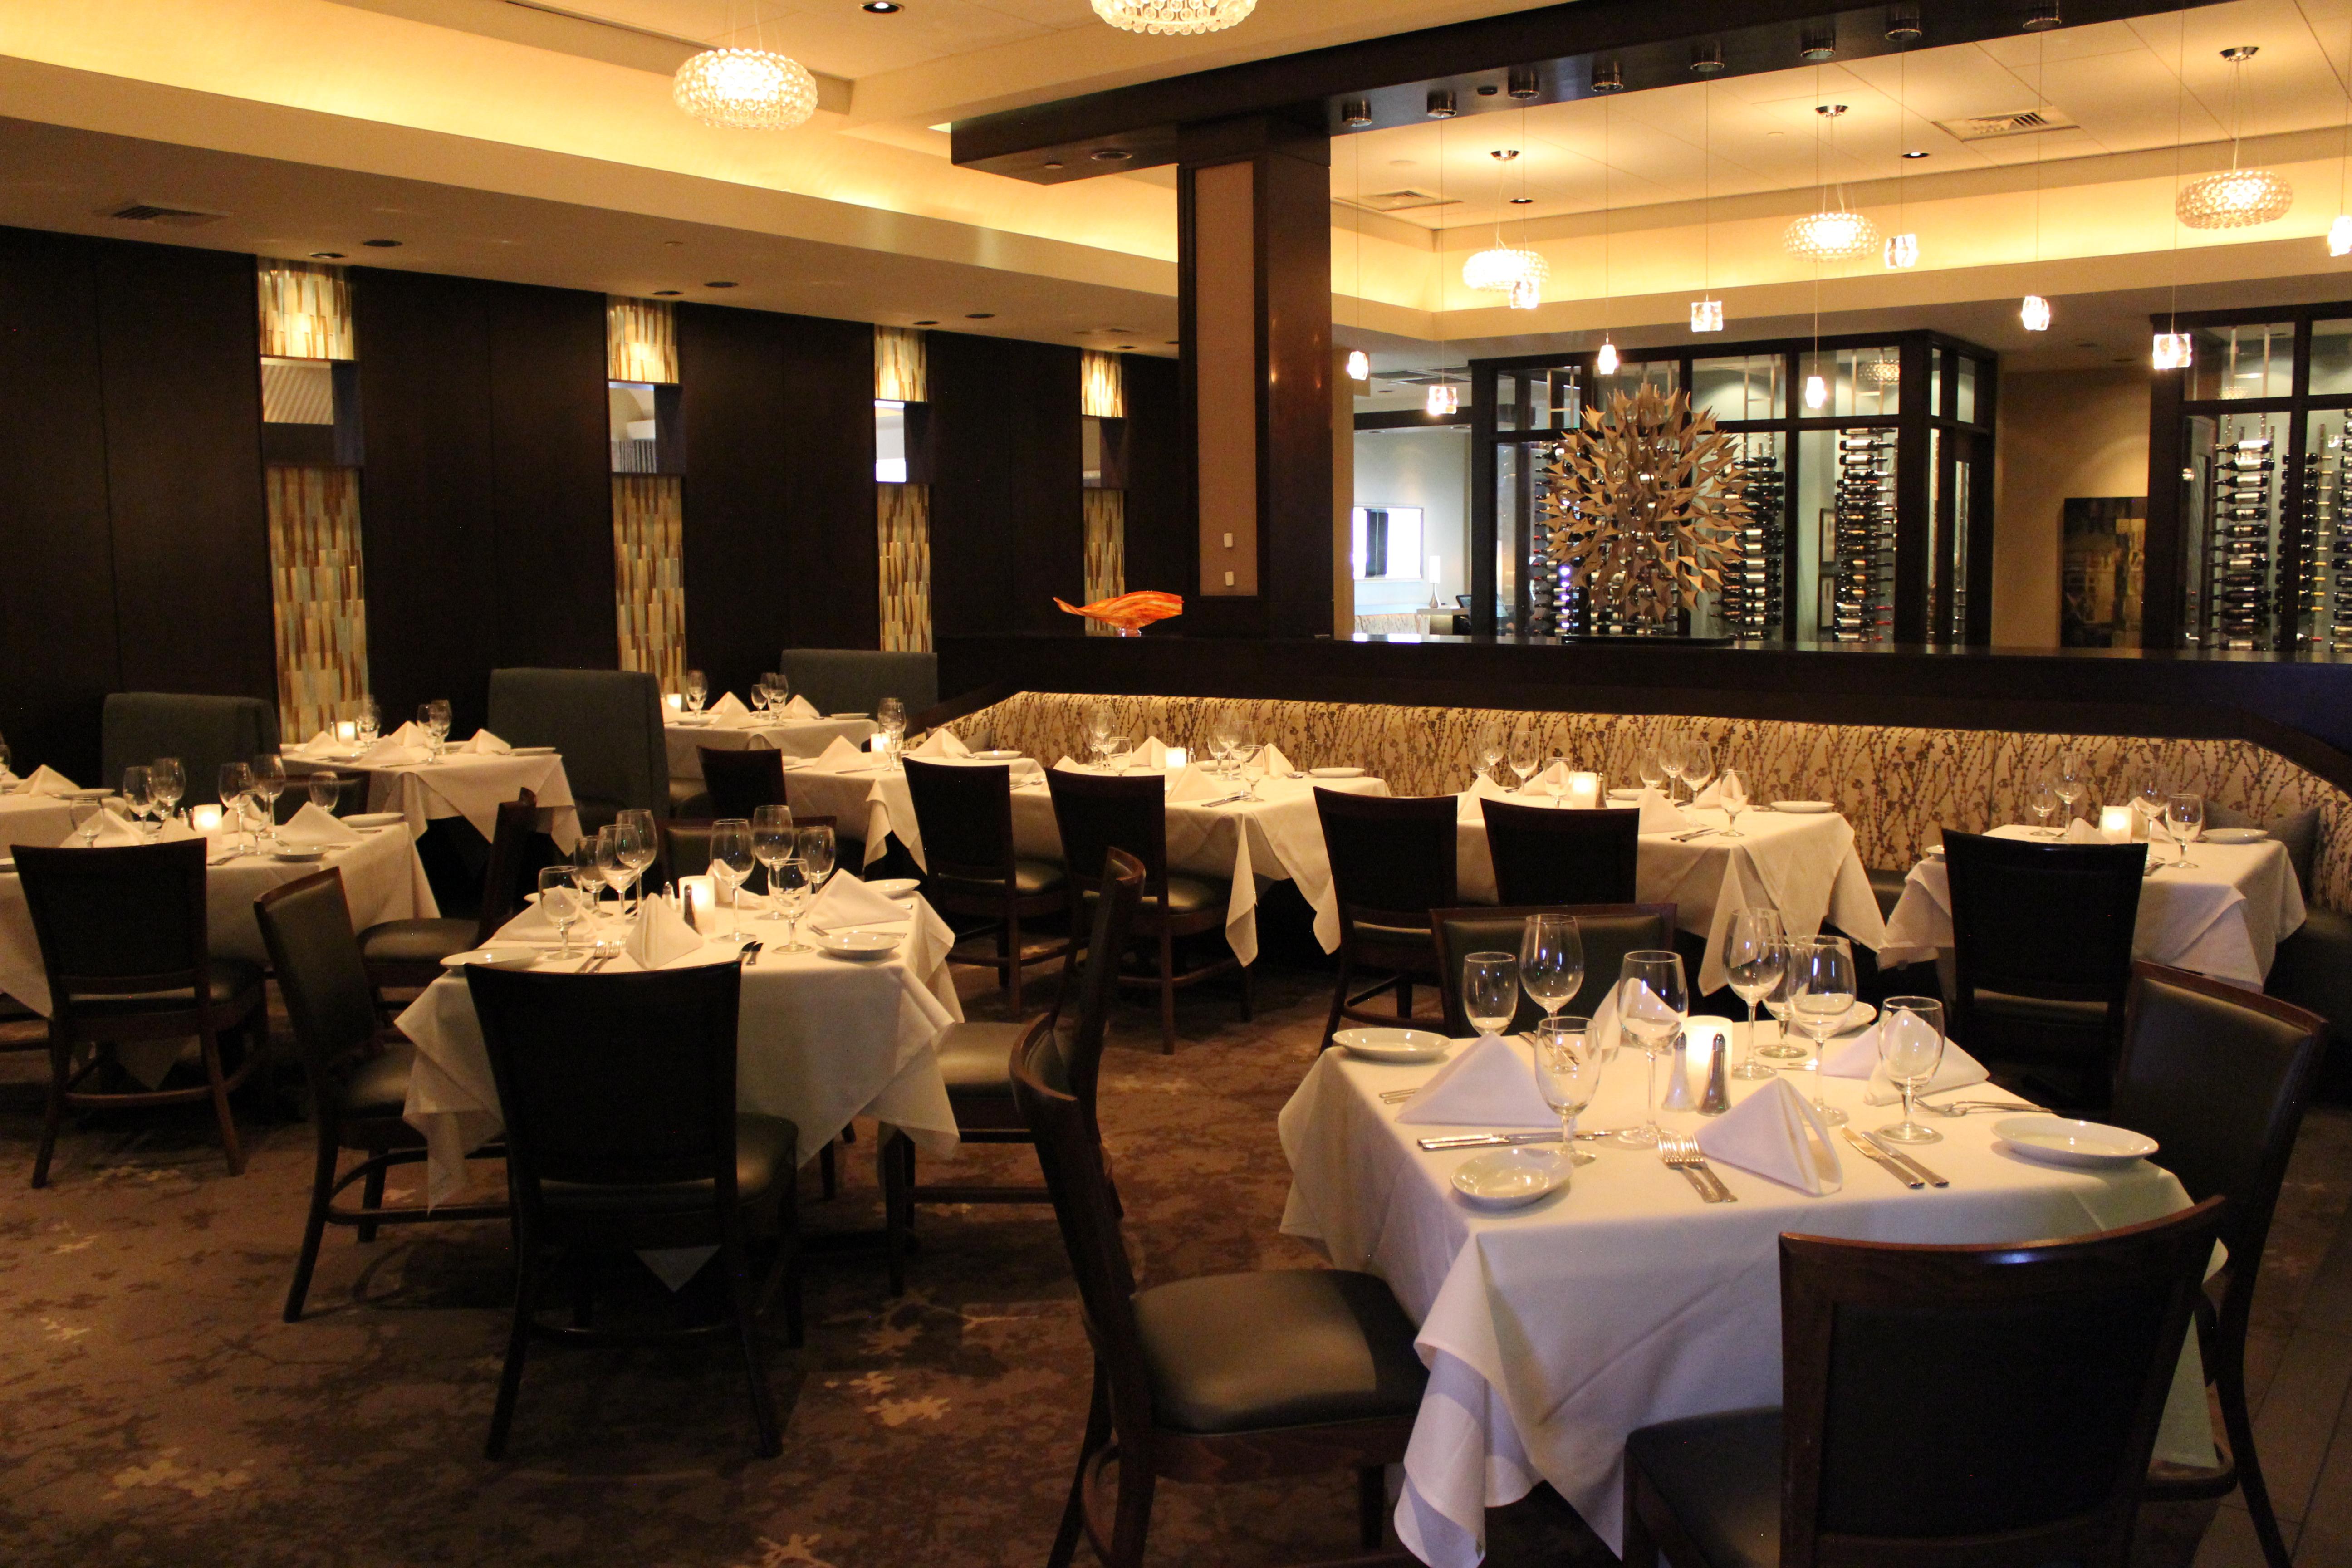 Ruths Chris Steak House Salt Lake City